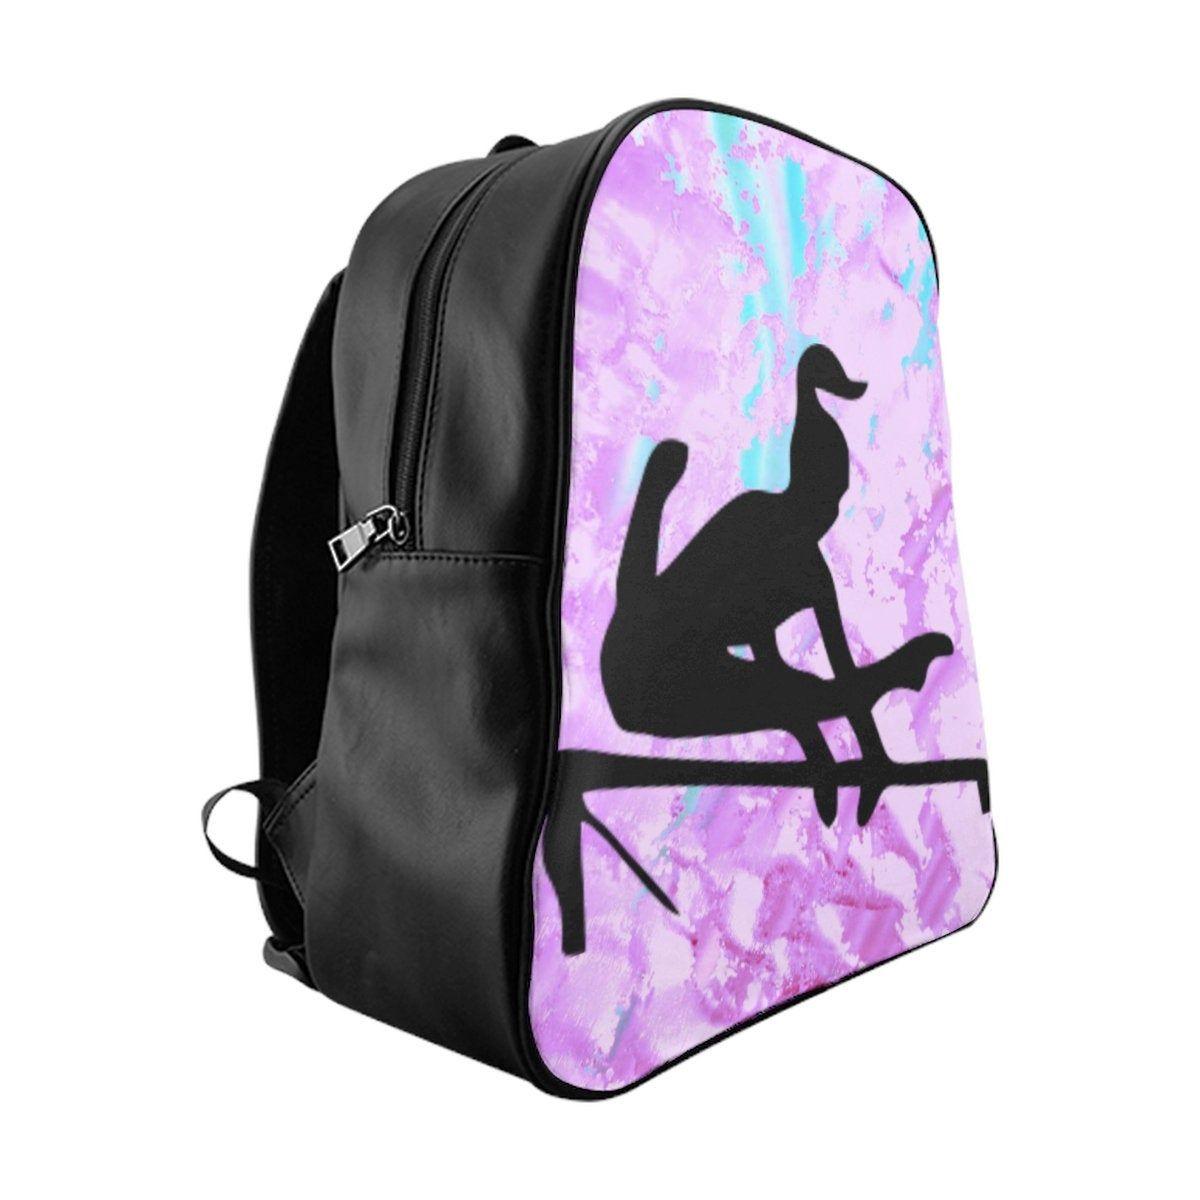 b264c45d5f57 Girls Gymnastics Uneven Bars Purple / Blue Abstract School Backpack ...